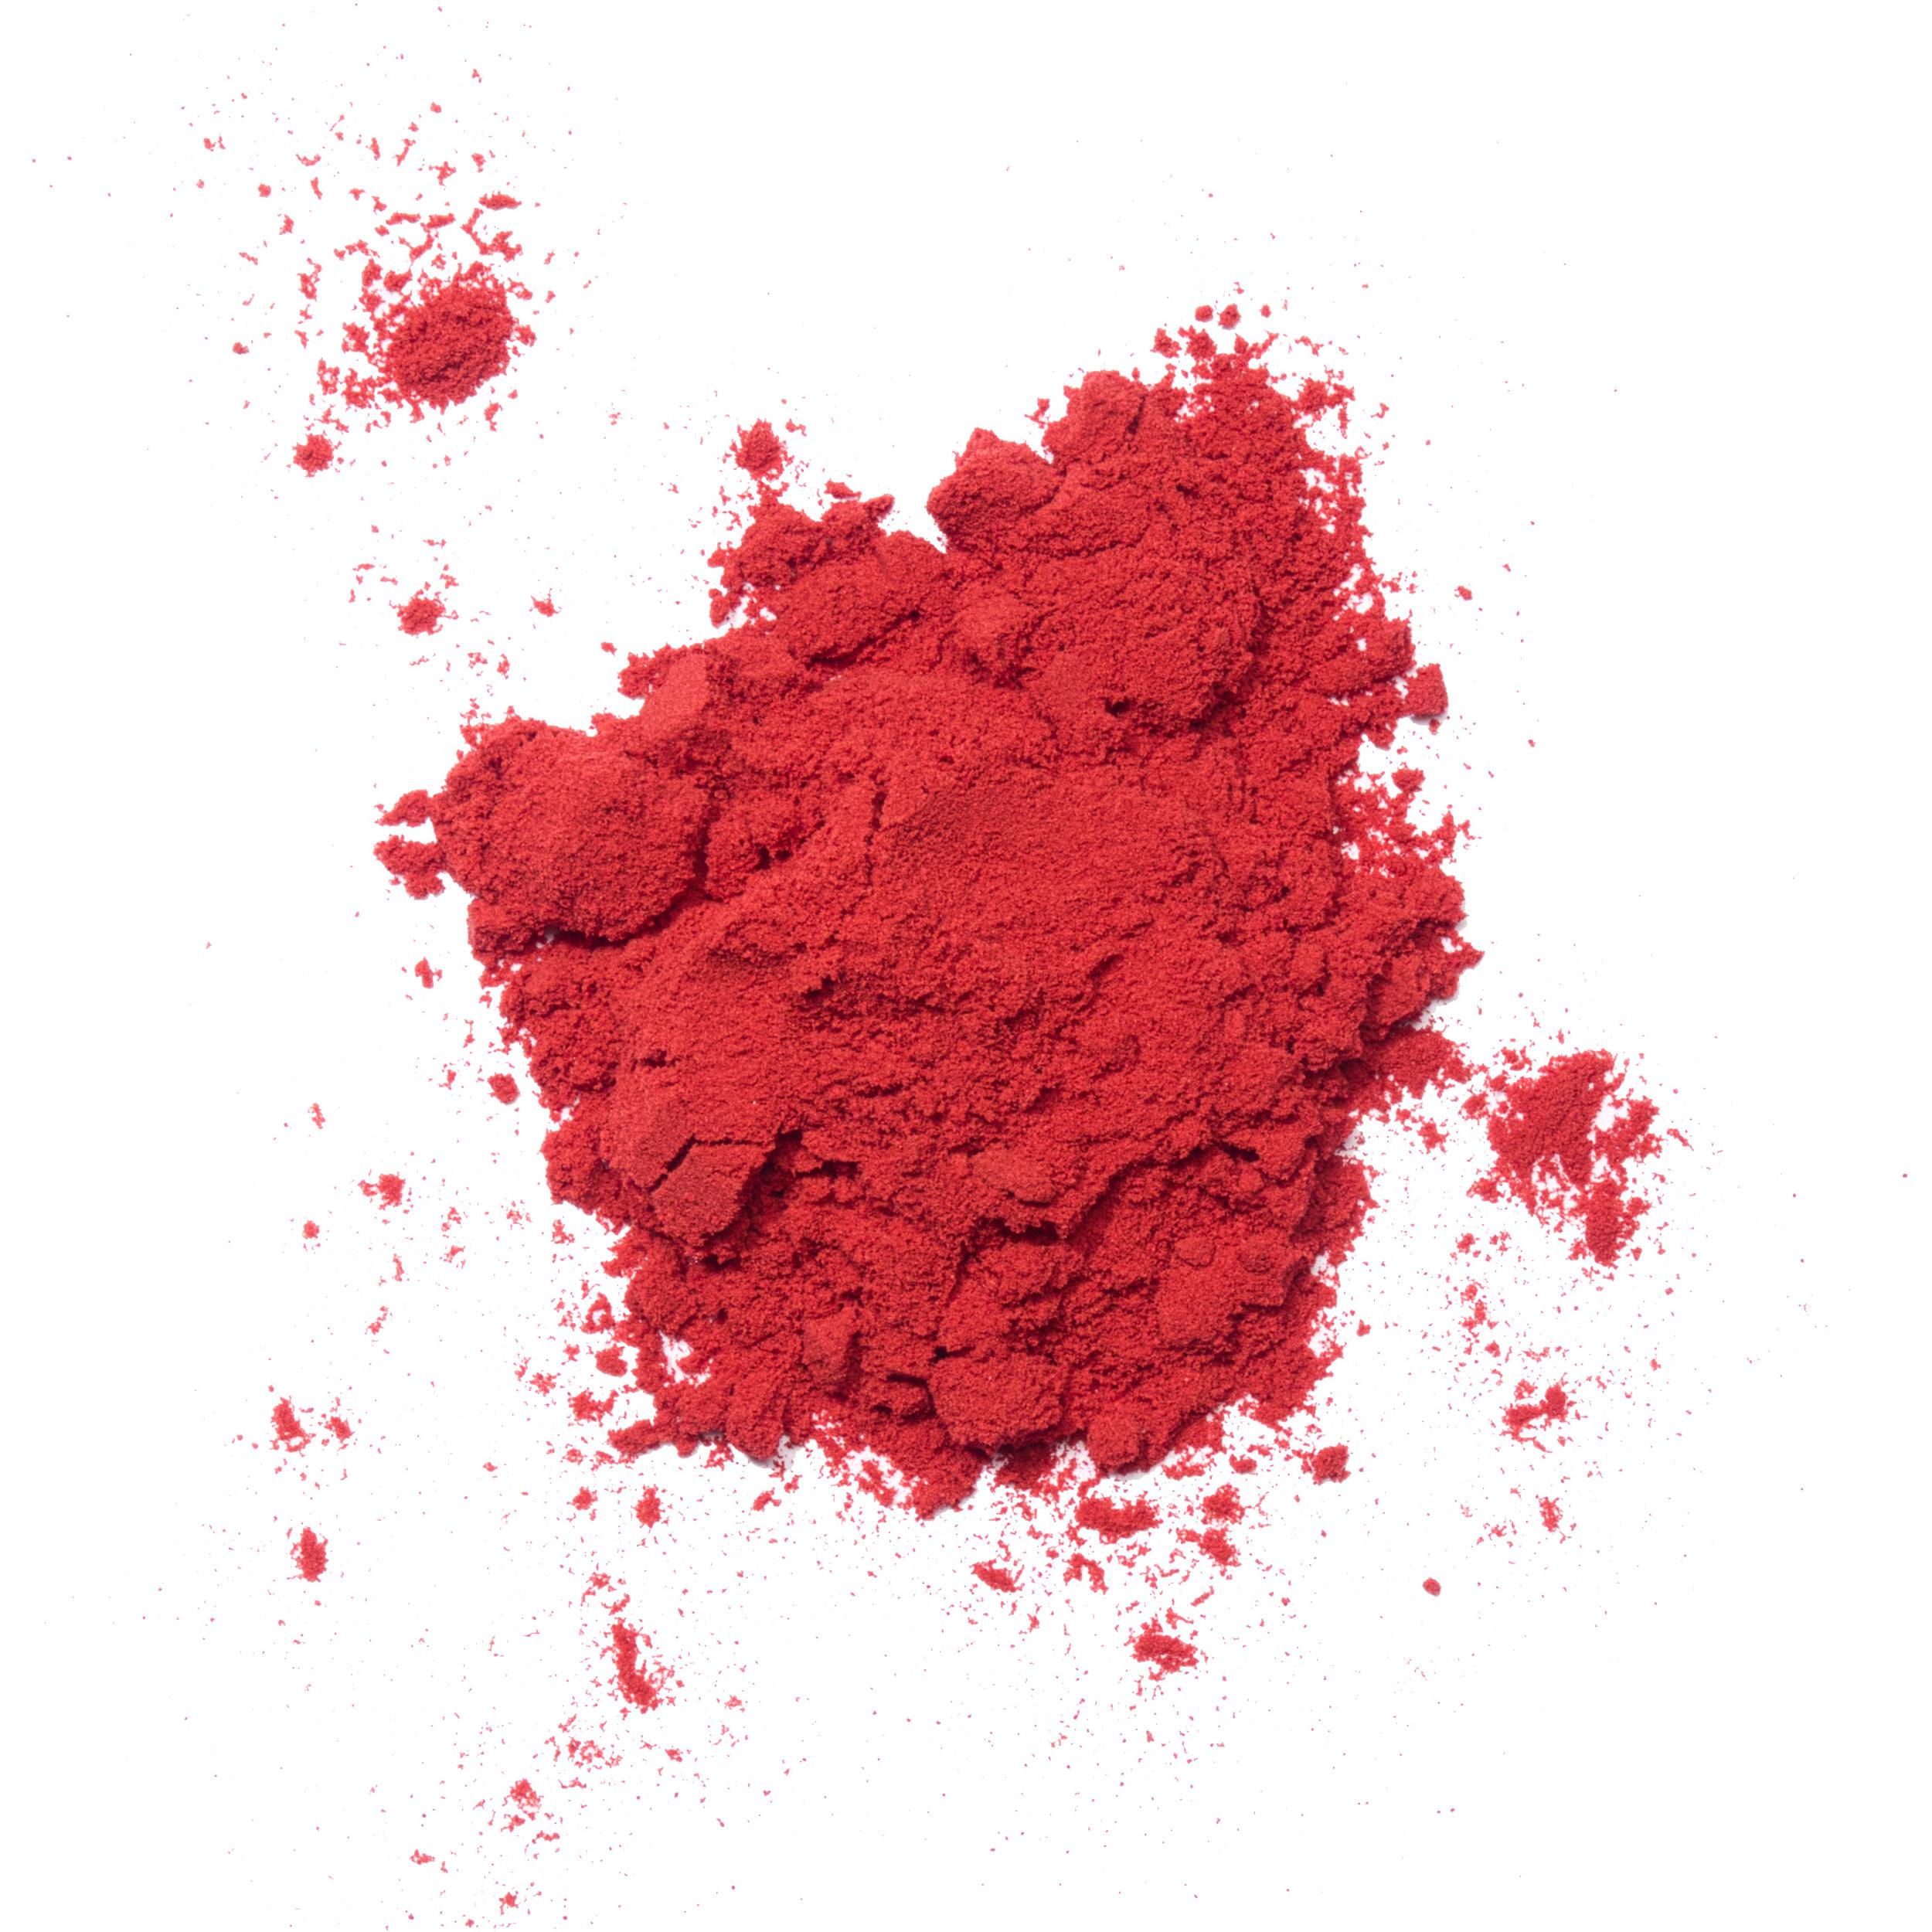 strawberry-powder.jpg